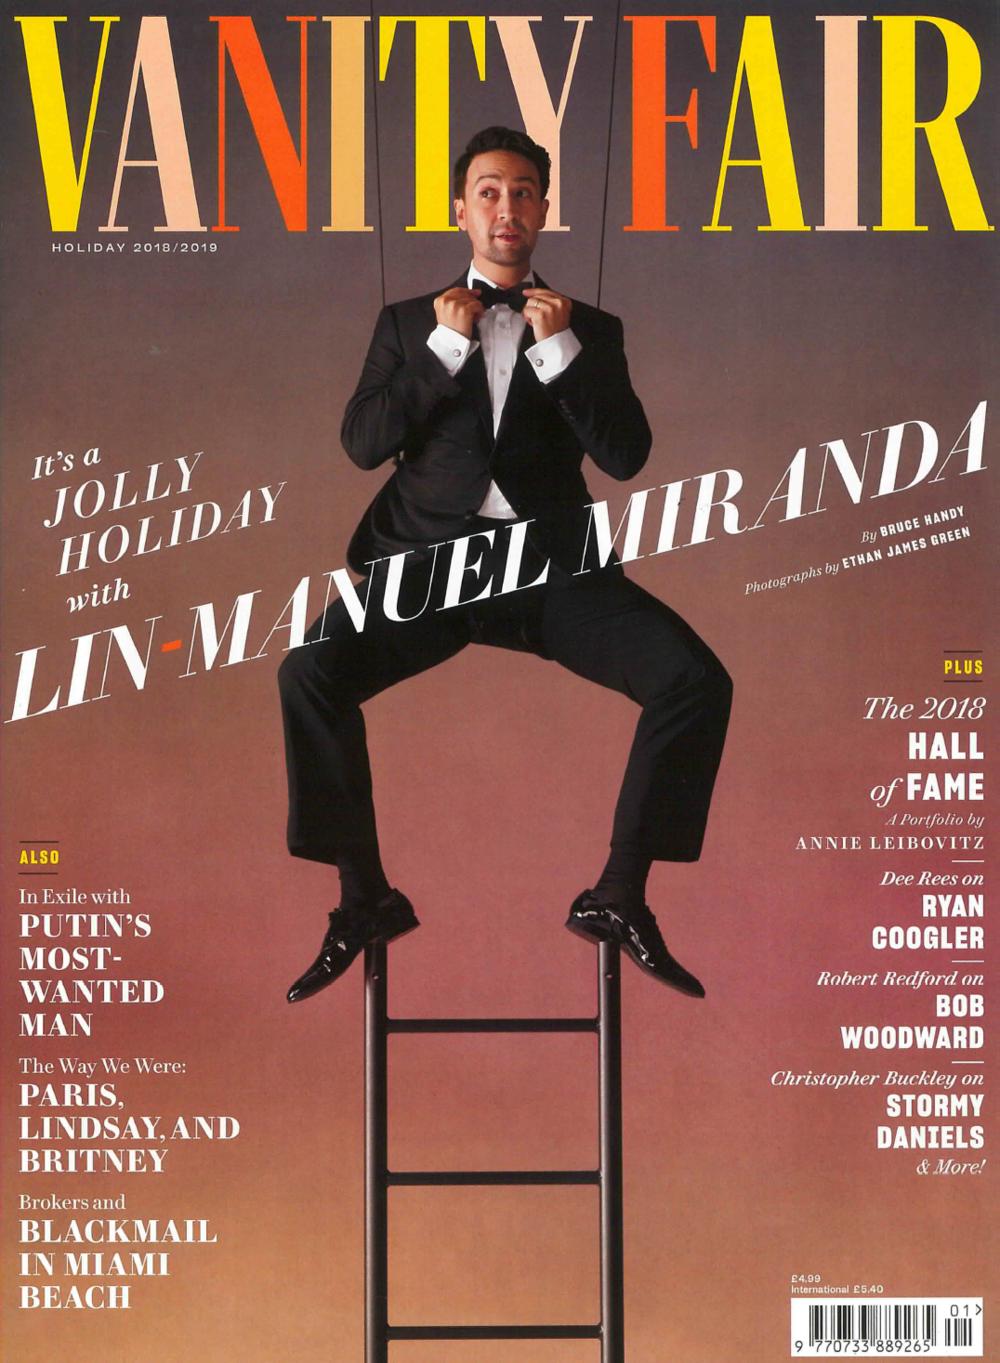 Vanity Fair- Holiday Edition 2018